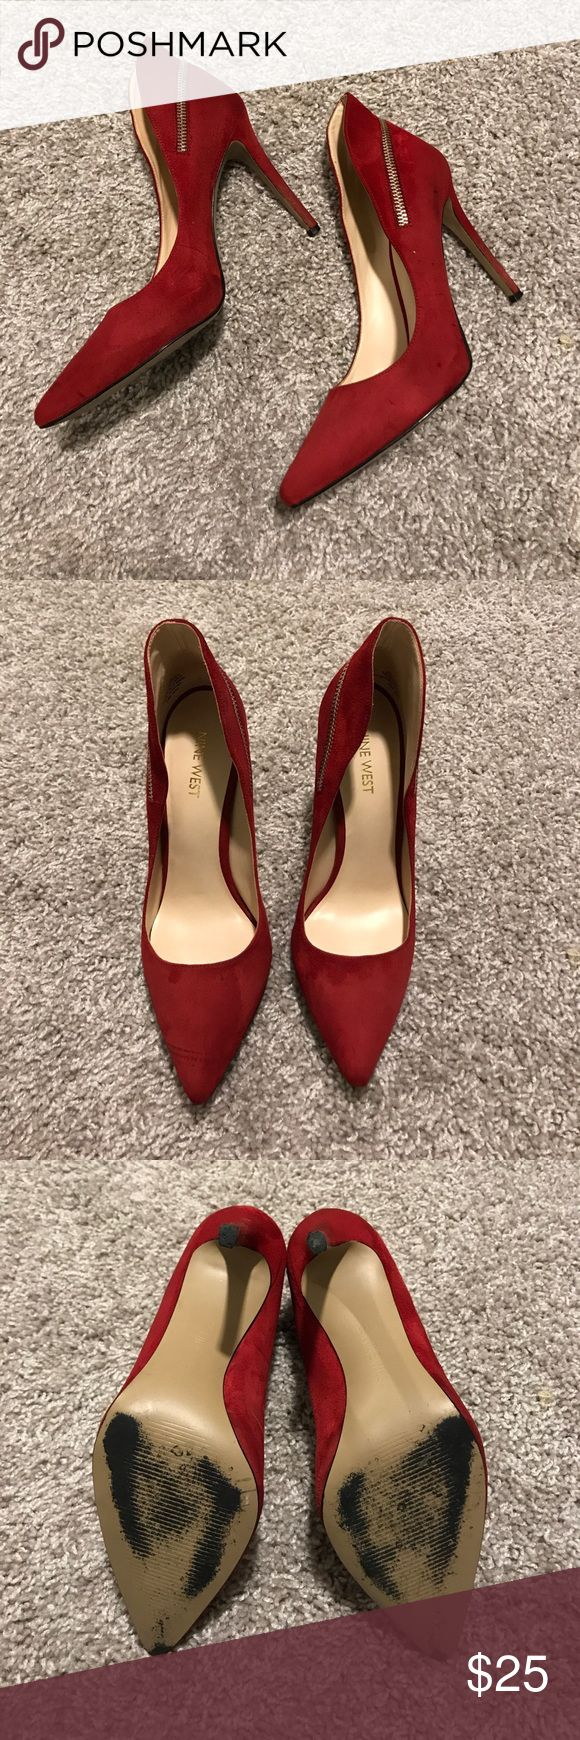 Nine West heels Nine West red pointed toe suede heels with silver zipper.  3 3/4 heels Worn 3 times. Good condition. Leather upper. Nine West Shoes Heels